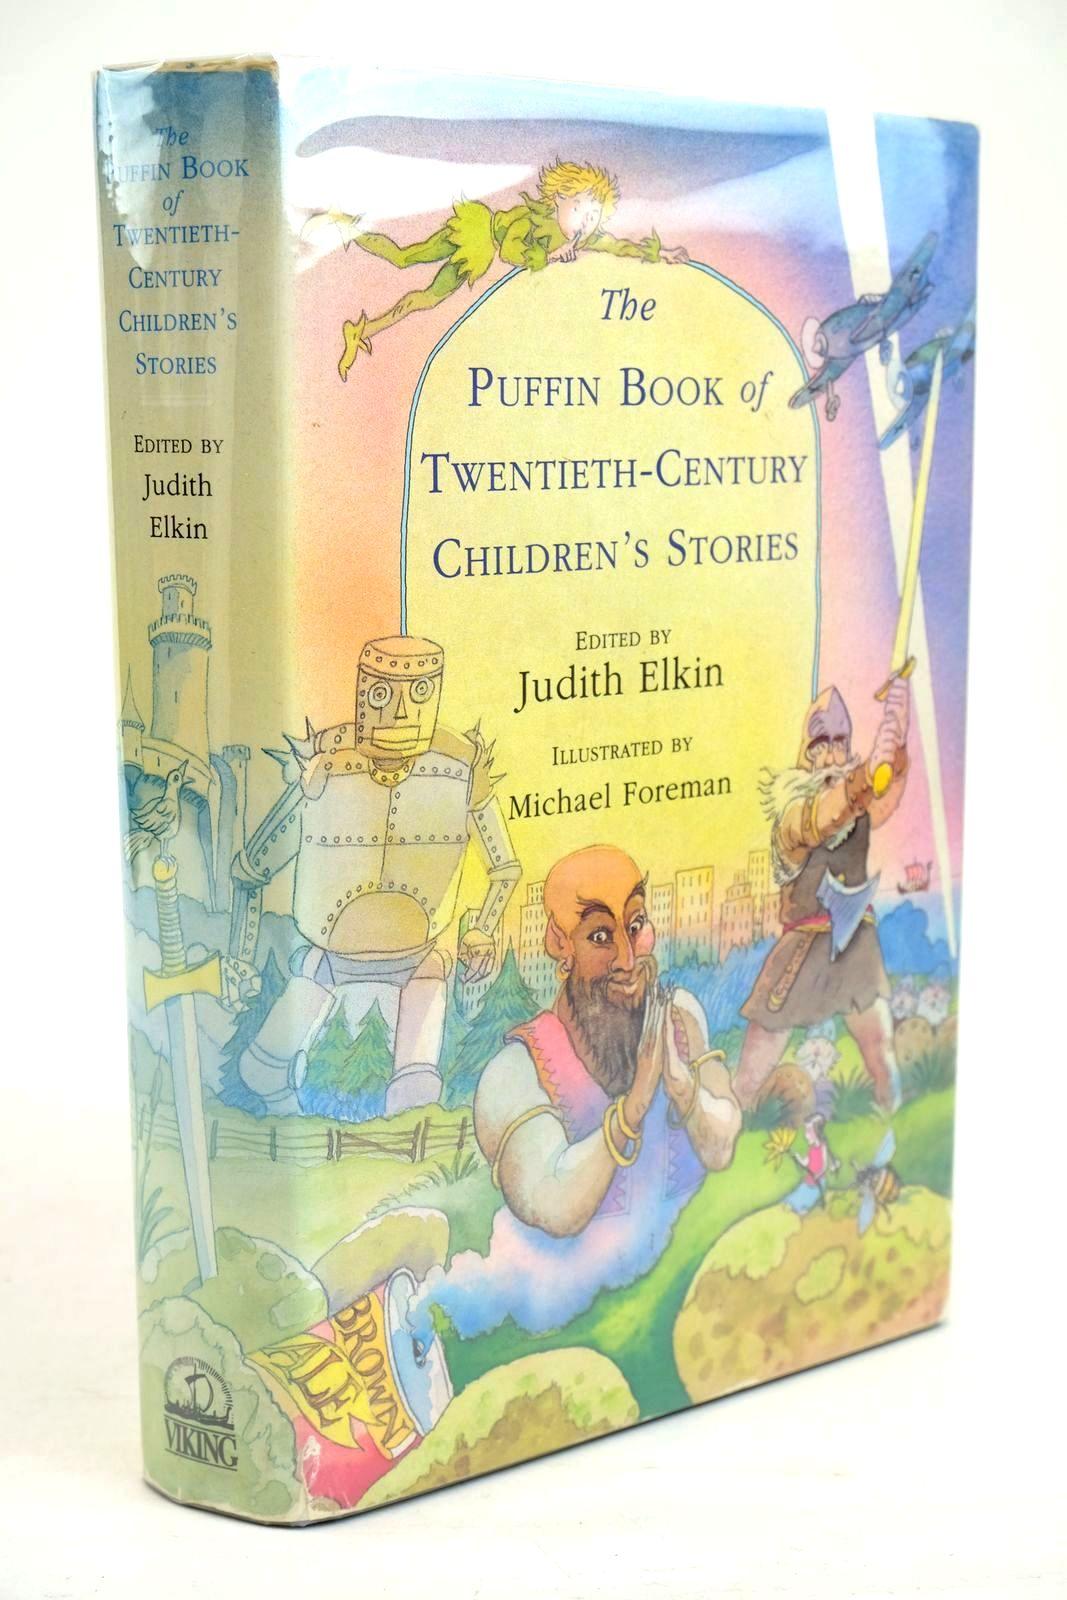 Photo of THE PUFFIN BOOK OF TWENTIETH-CENTURY CHILDREN'S STORIES- Stock Number: 1320483